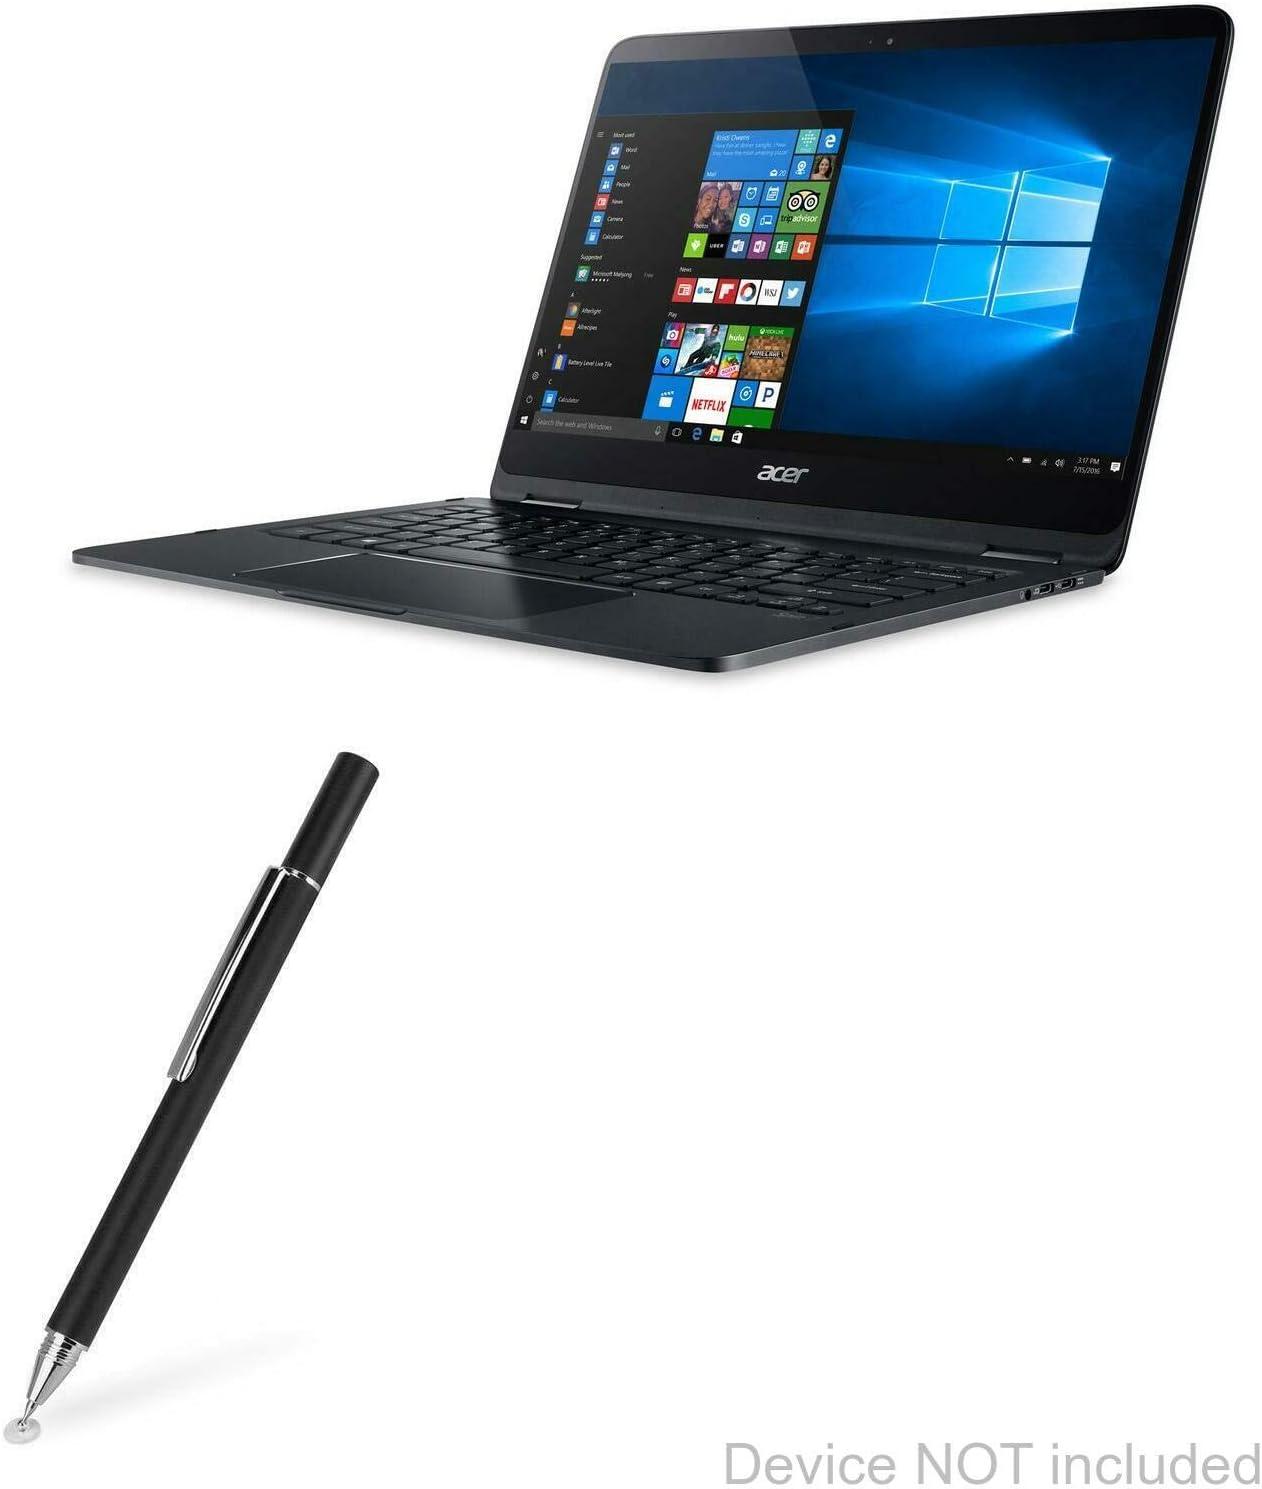 SP714-51 Fiber Tip Capacitive Stylus Pen for Acer Spin 7 BoxWave - Jet Black Acer Spin 7 Stylus Pen SP714-51 EverTouch Capacitive Stylus